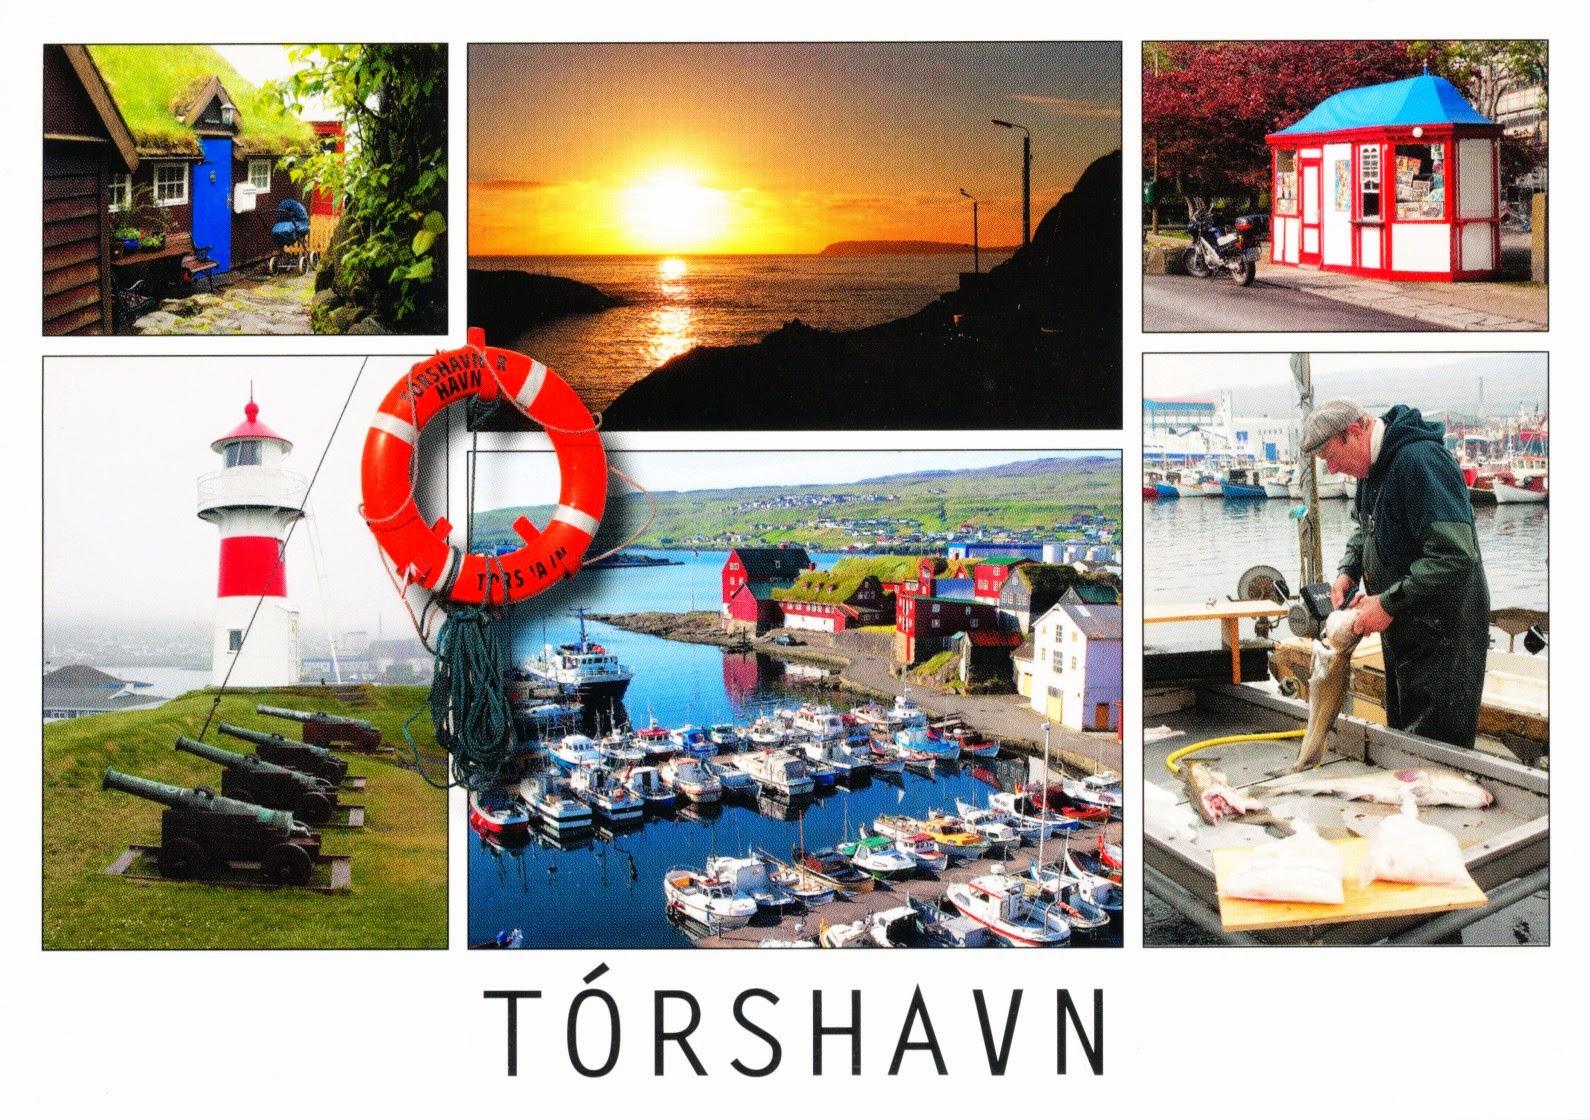 tórshavn, postcard, faroe islands, harbor